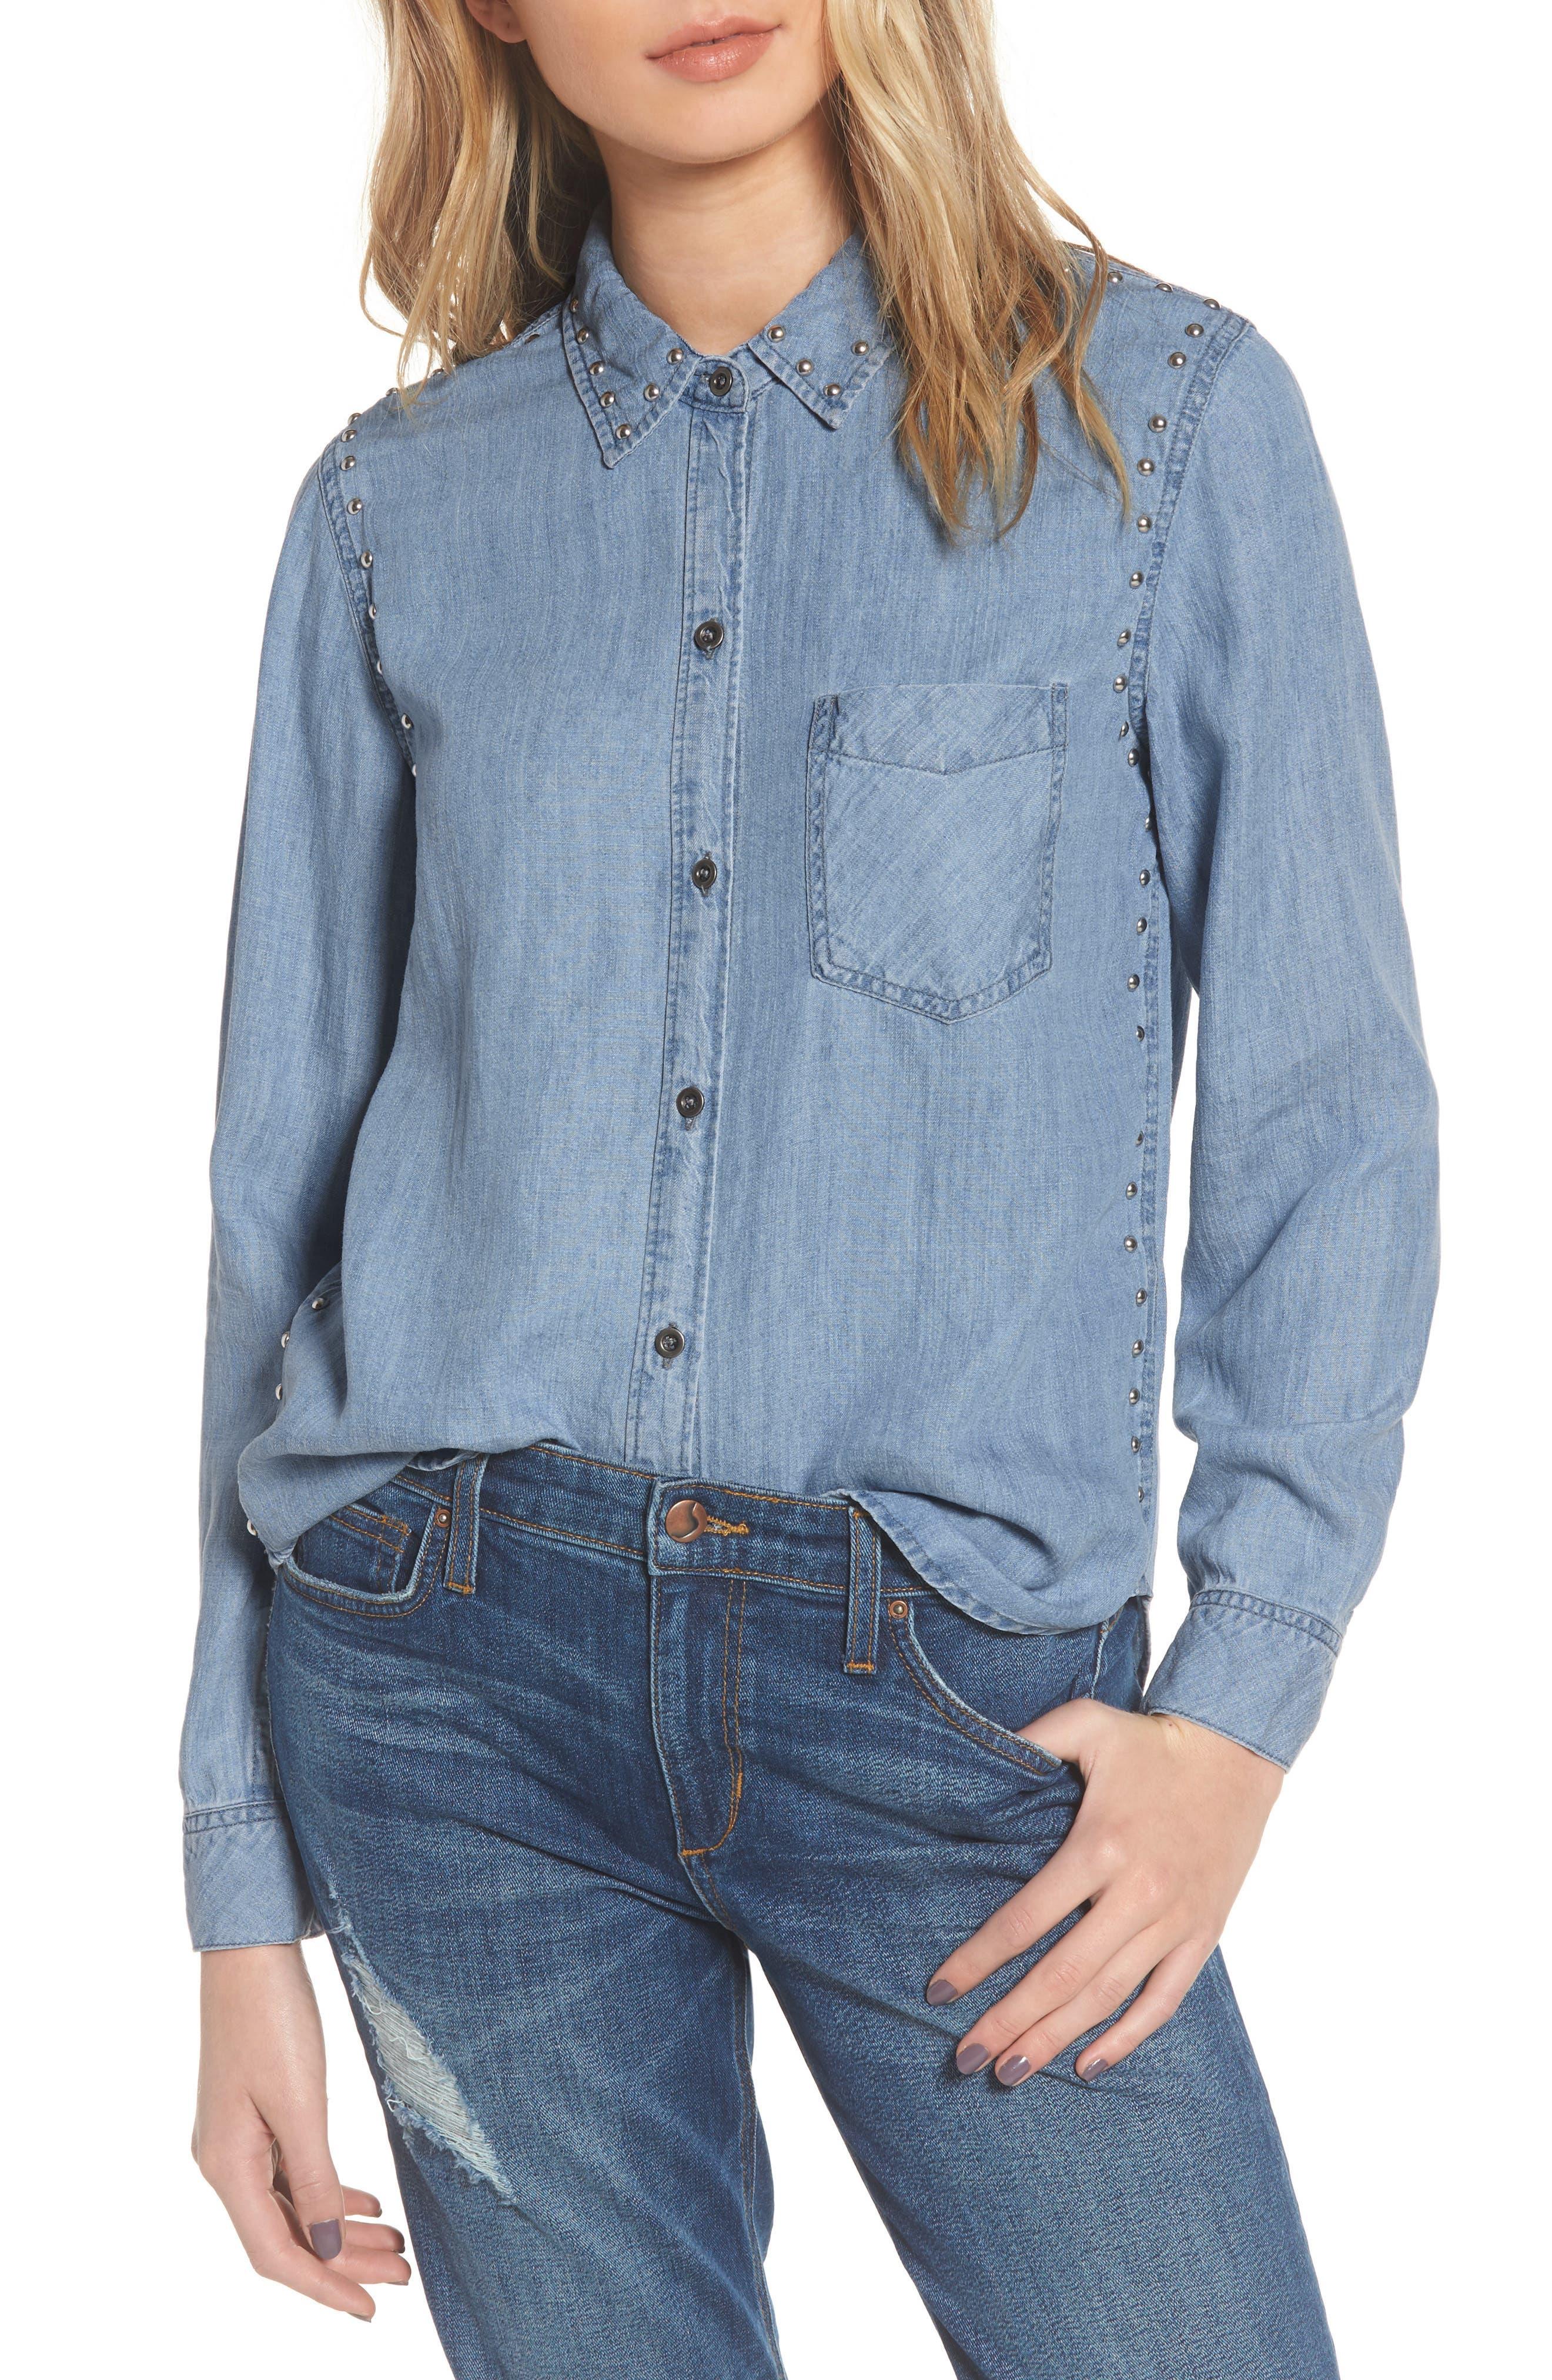 Ingrid Studded Shirt,                         Main,                         color, 493